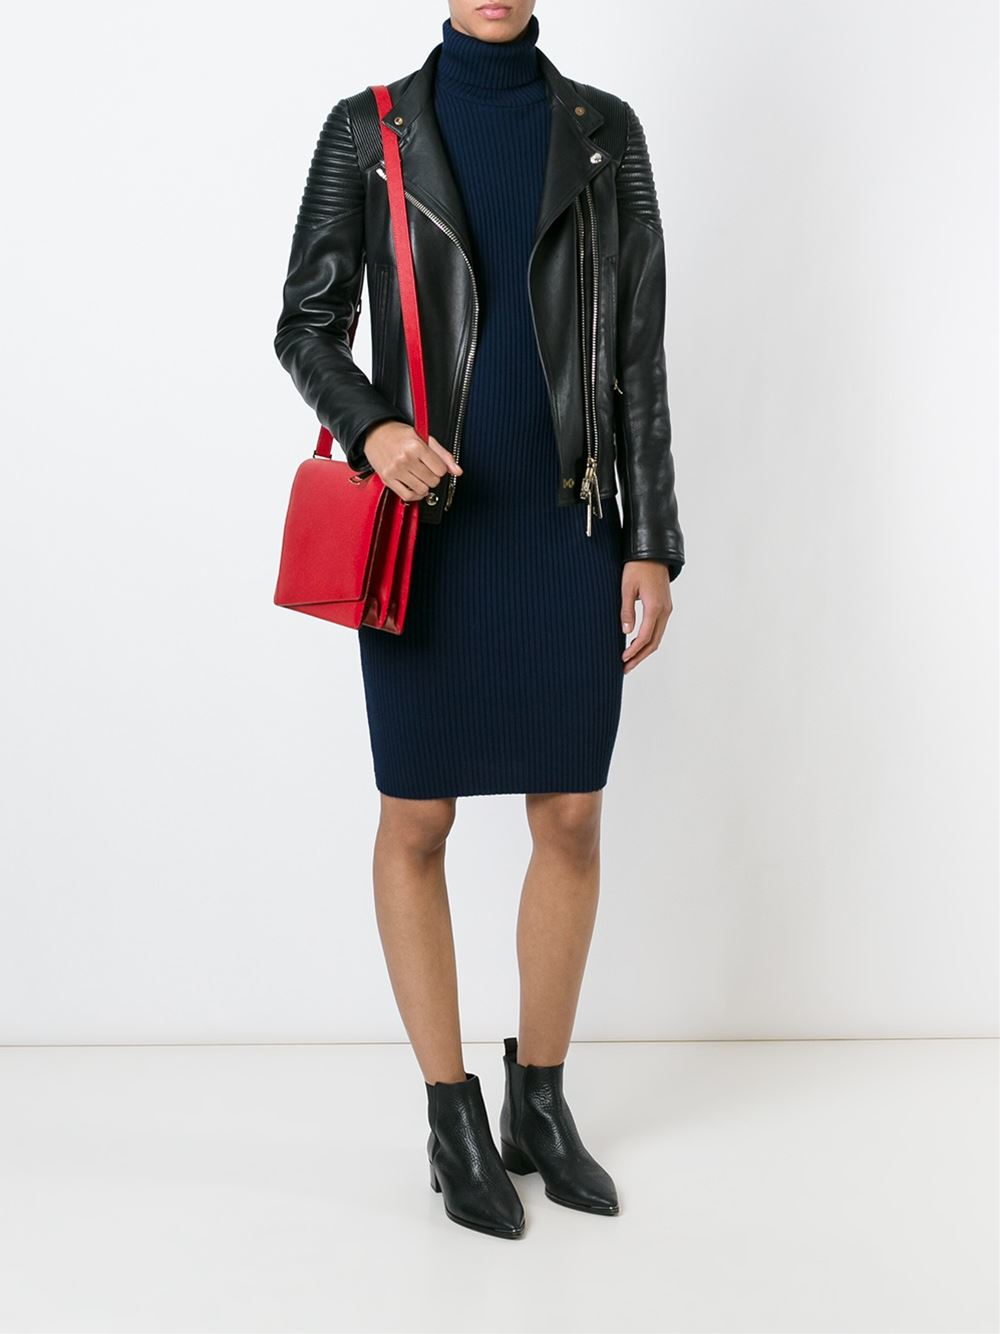 Valextra Twist Cross-Body Bag in Red